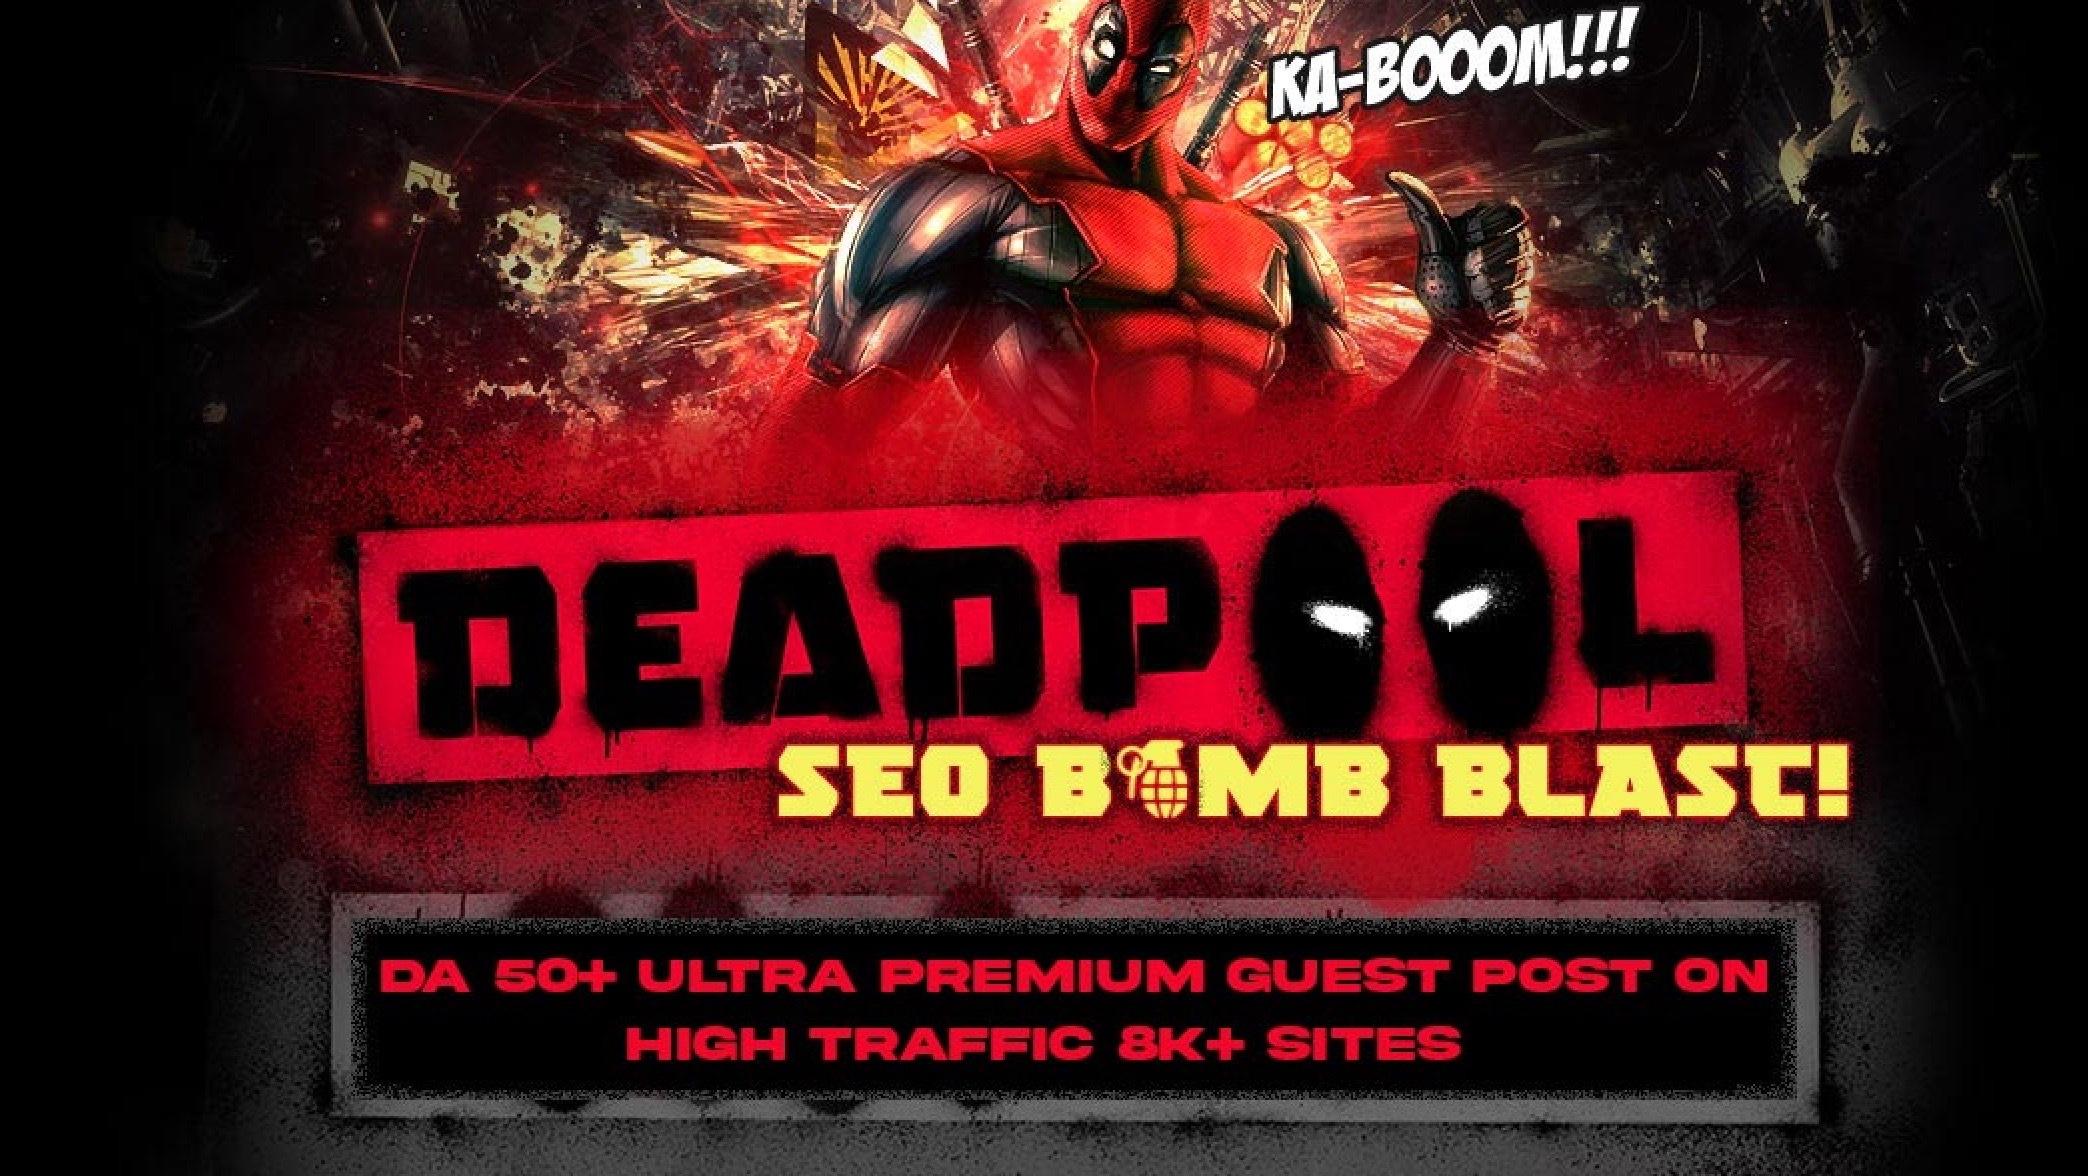 DA 50+ ULTRA Premium Guest Post On High Traffic Site - DEADPOOL SEO BOMB BLAST